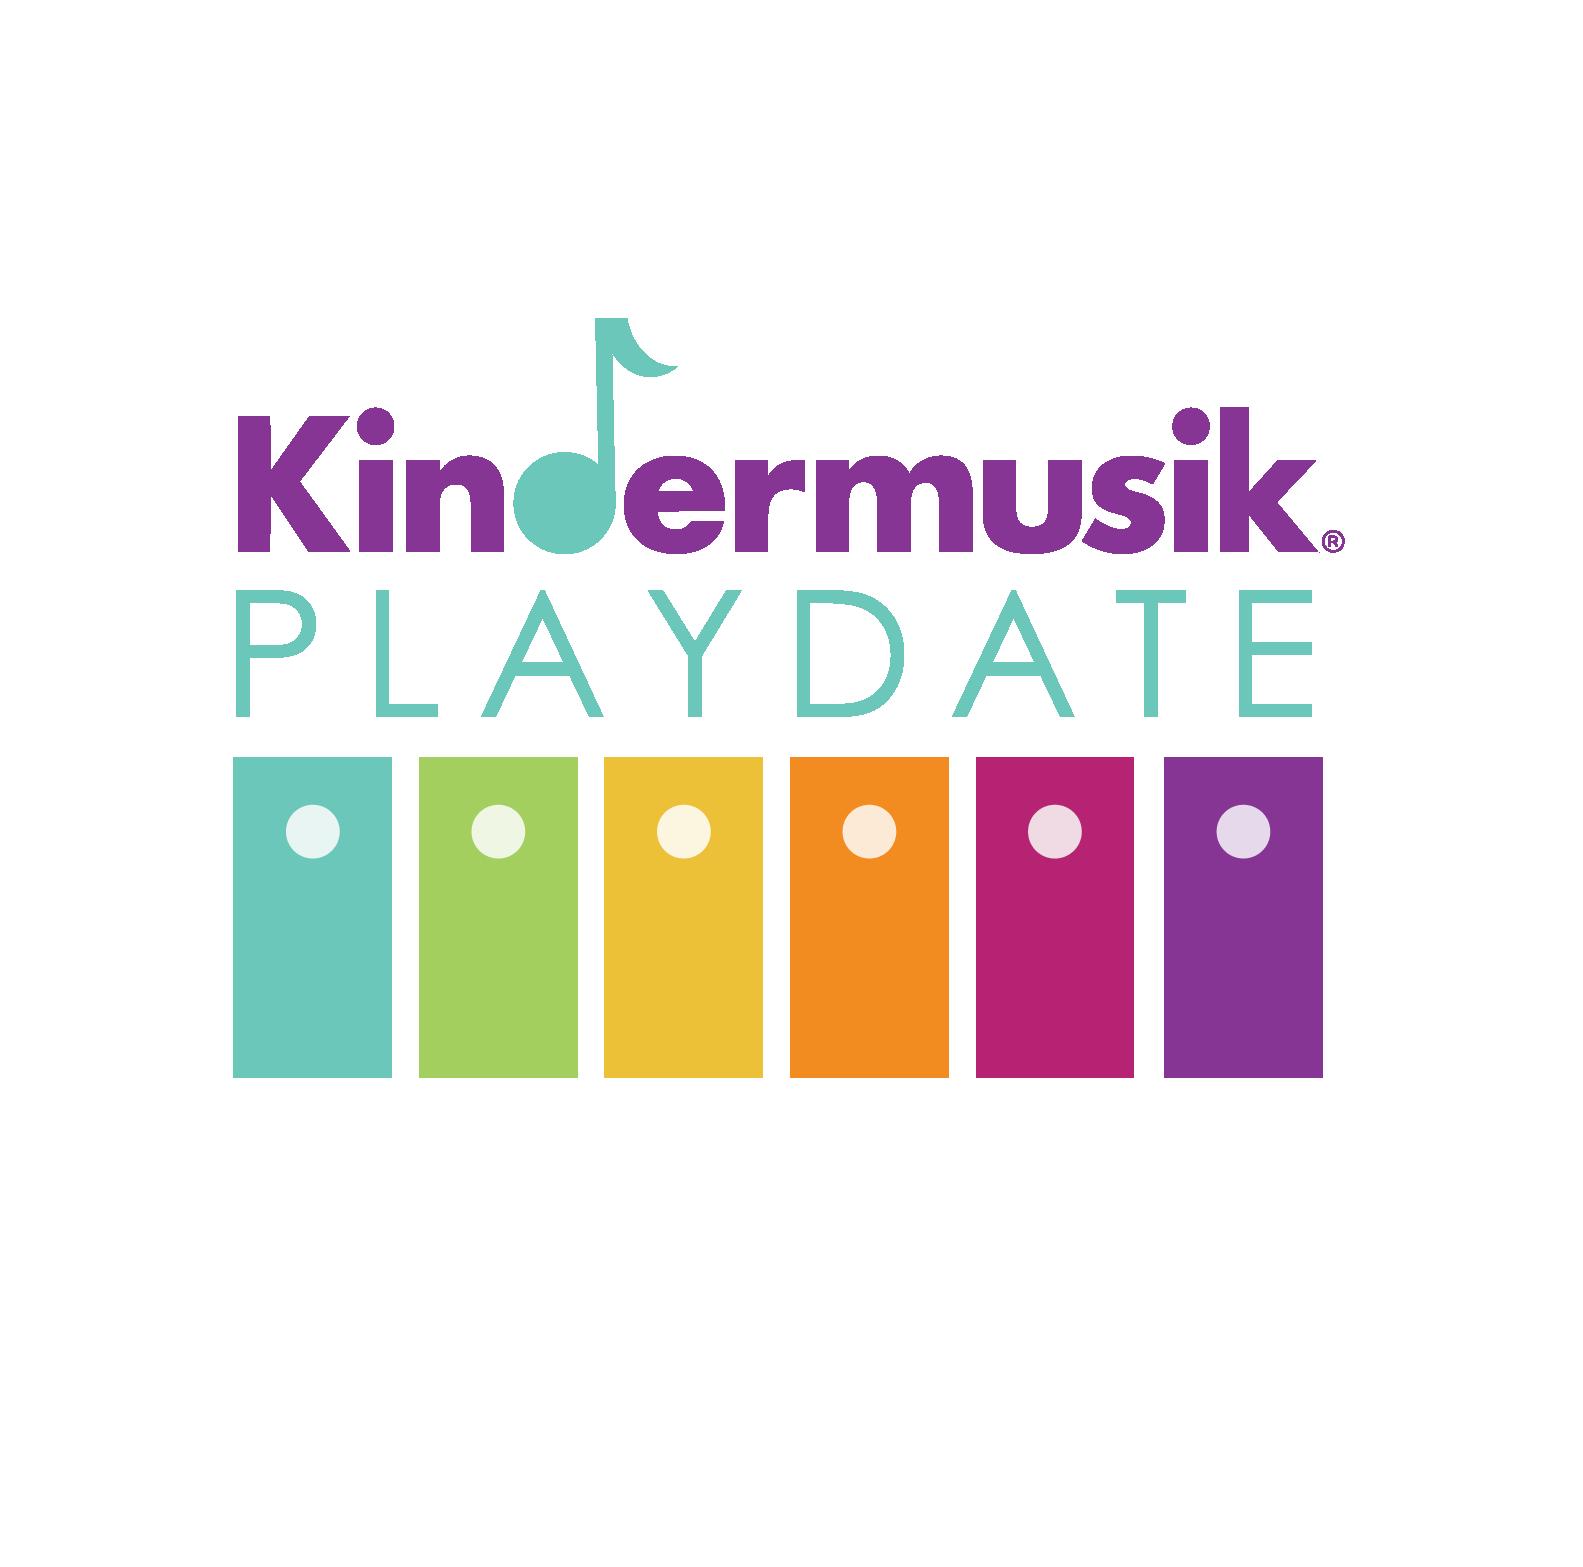 kindermusik playdates injoy music